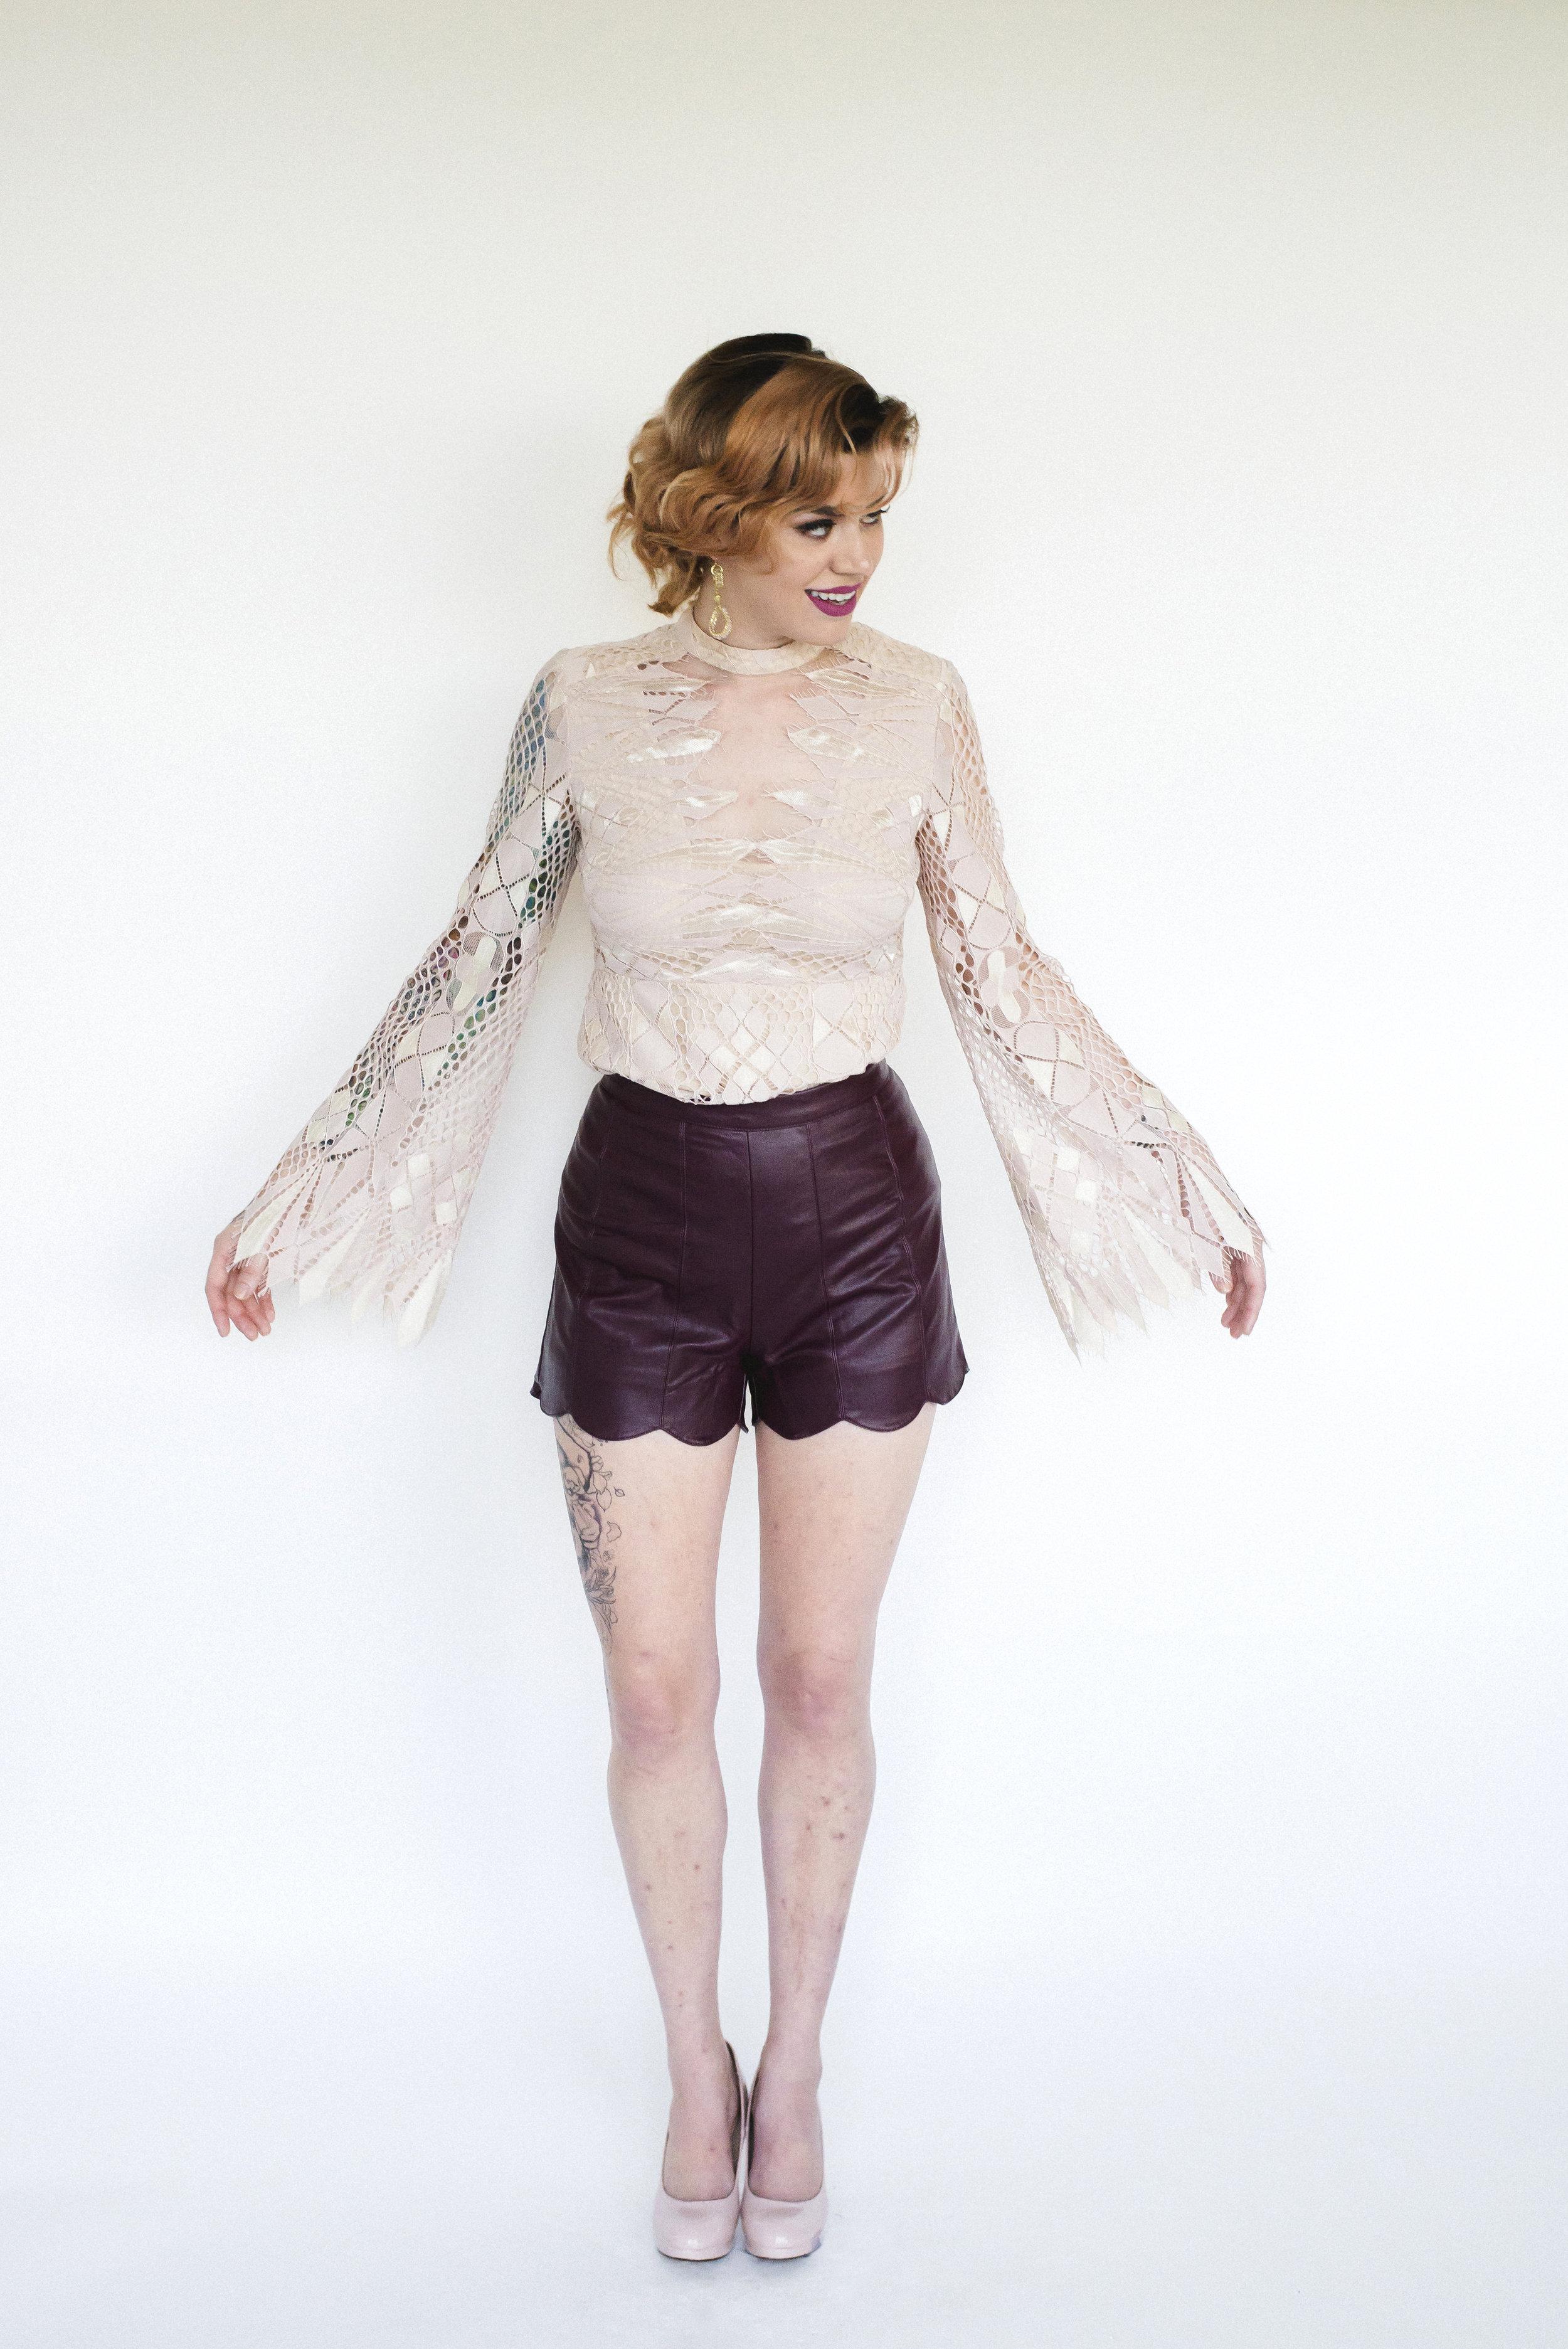 Kimberly Meadowlark December Fashion_Allie Appel_86.jpg